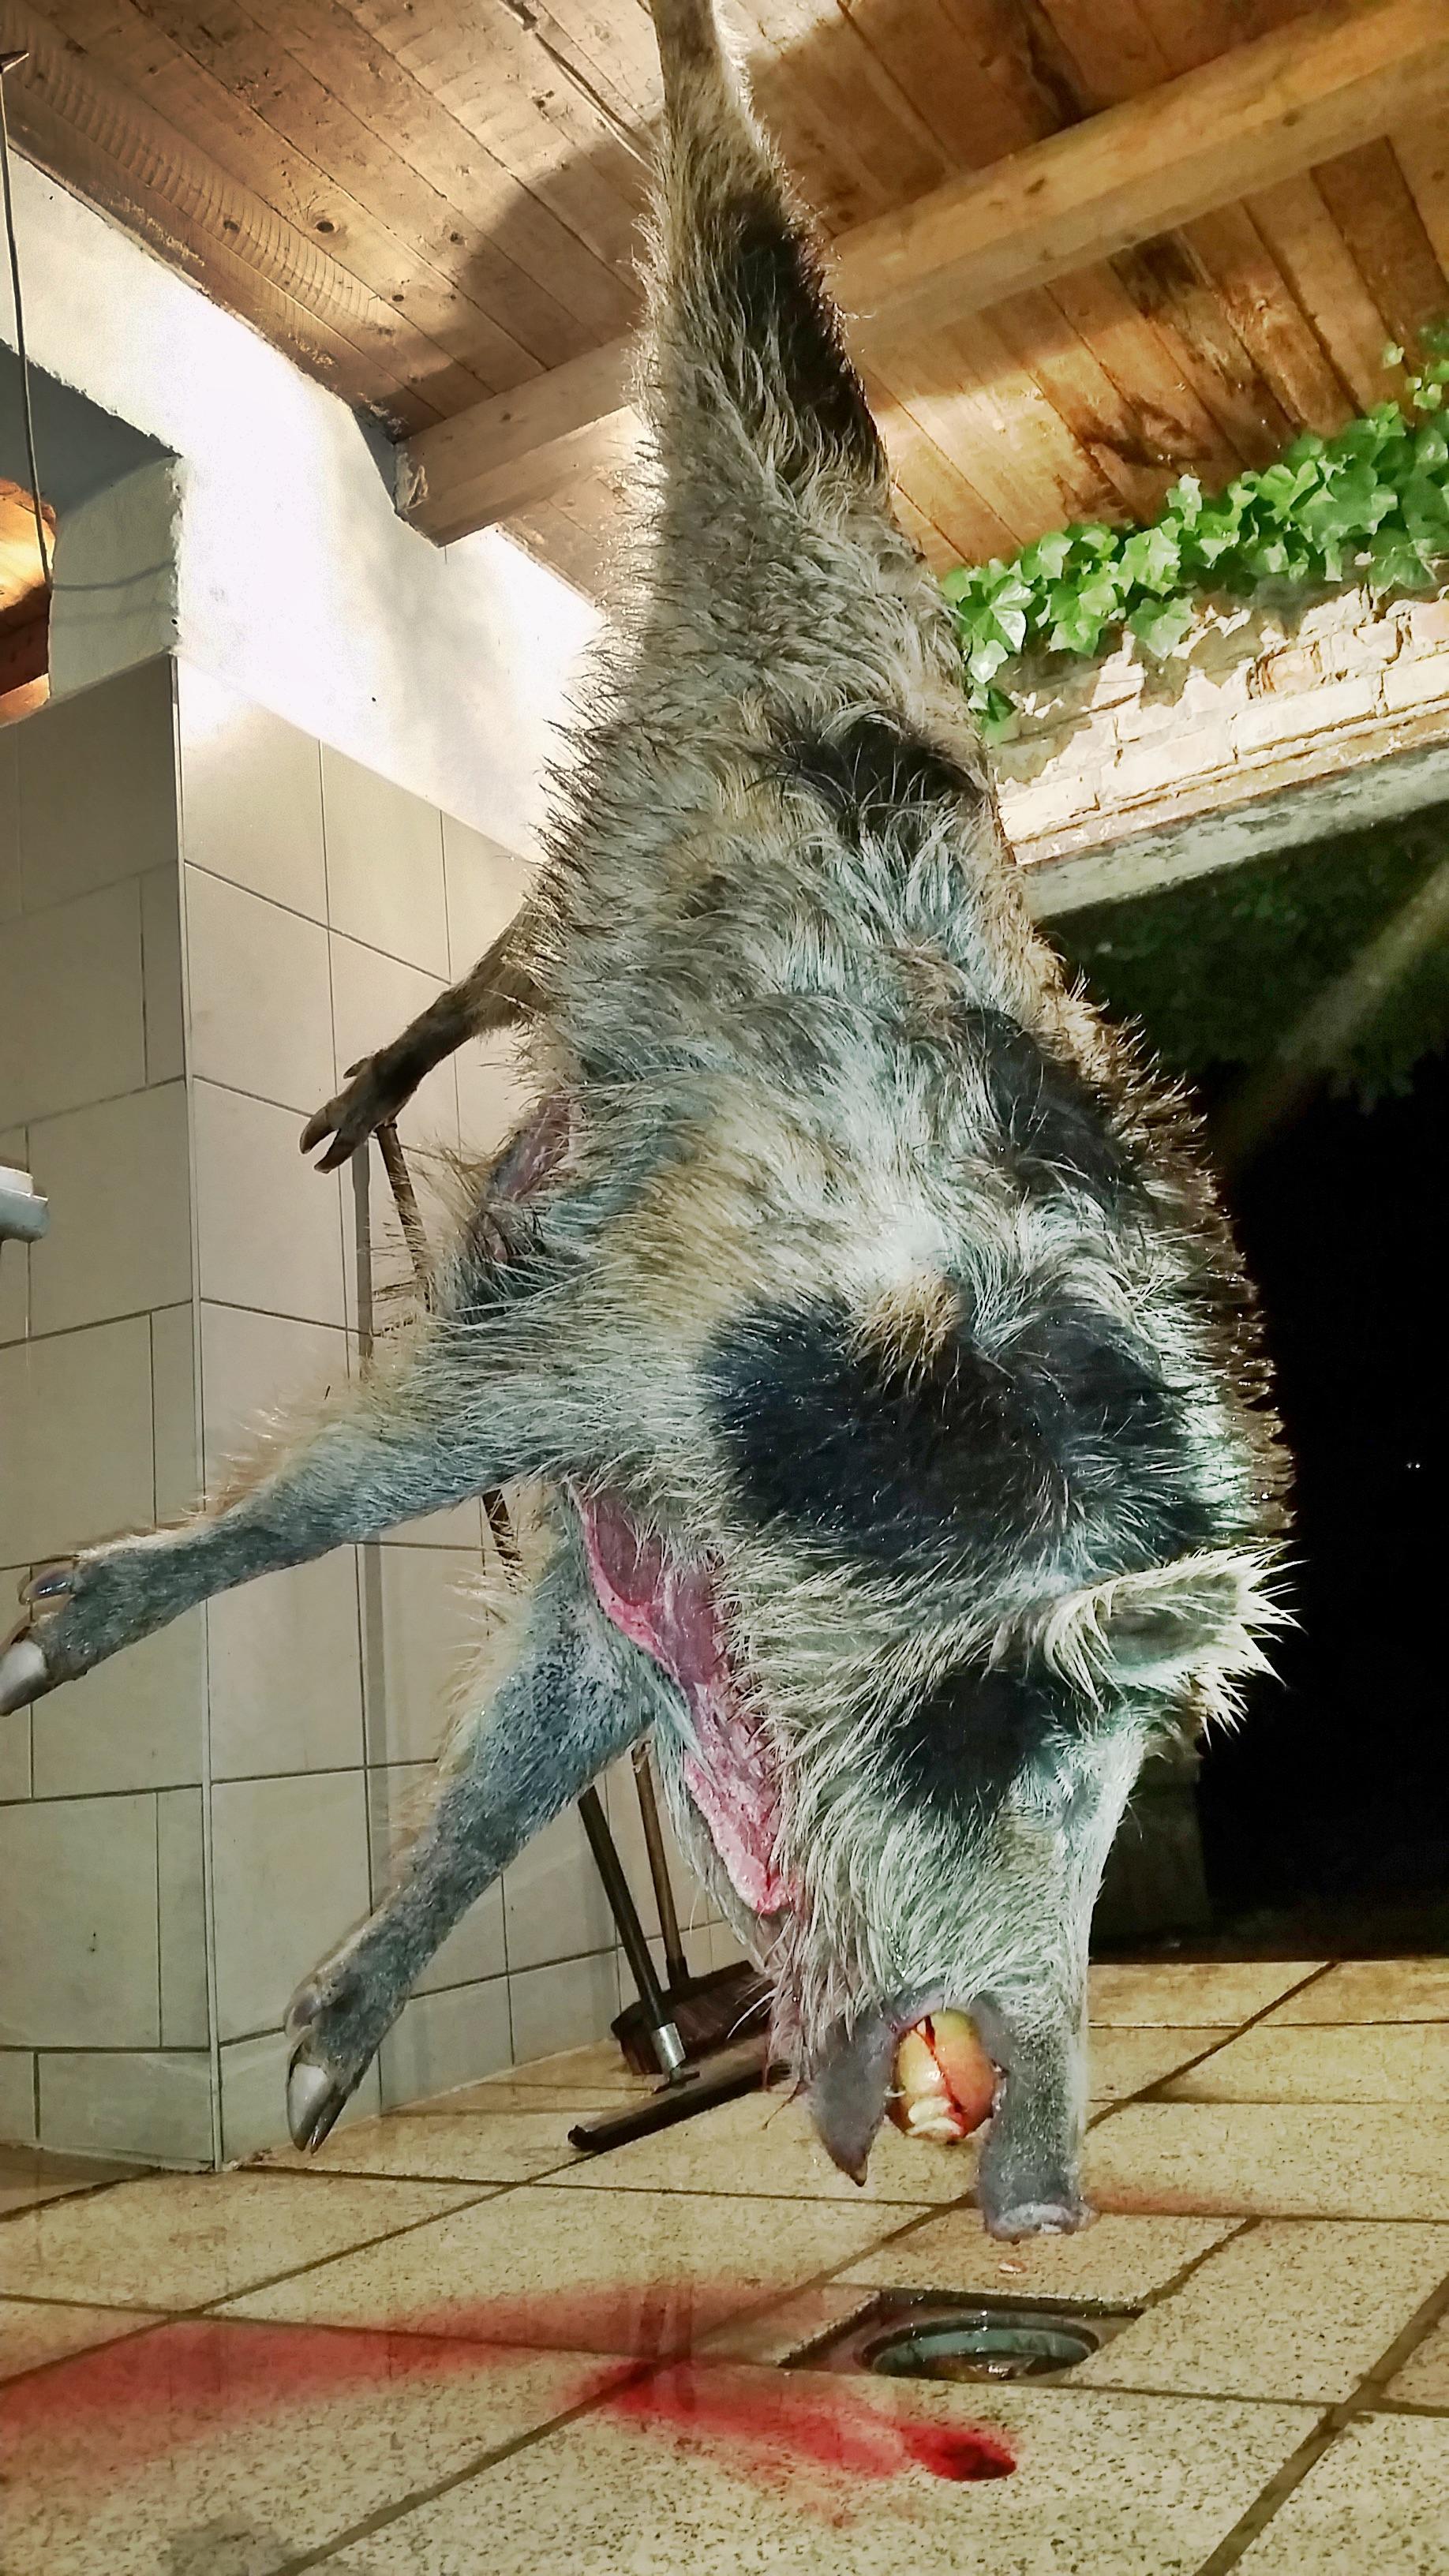 pauls-weissbunter-wog-76kg.-jagd-jagen-jaeger-jaegermagazin-wilddiebe-damwildbrunft-damhirsch.